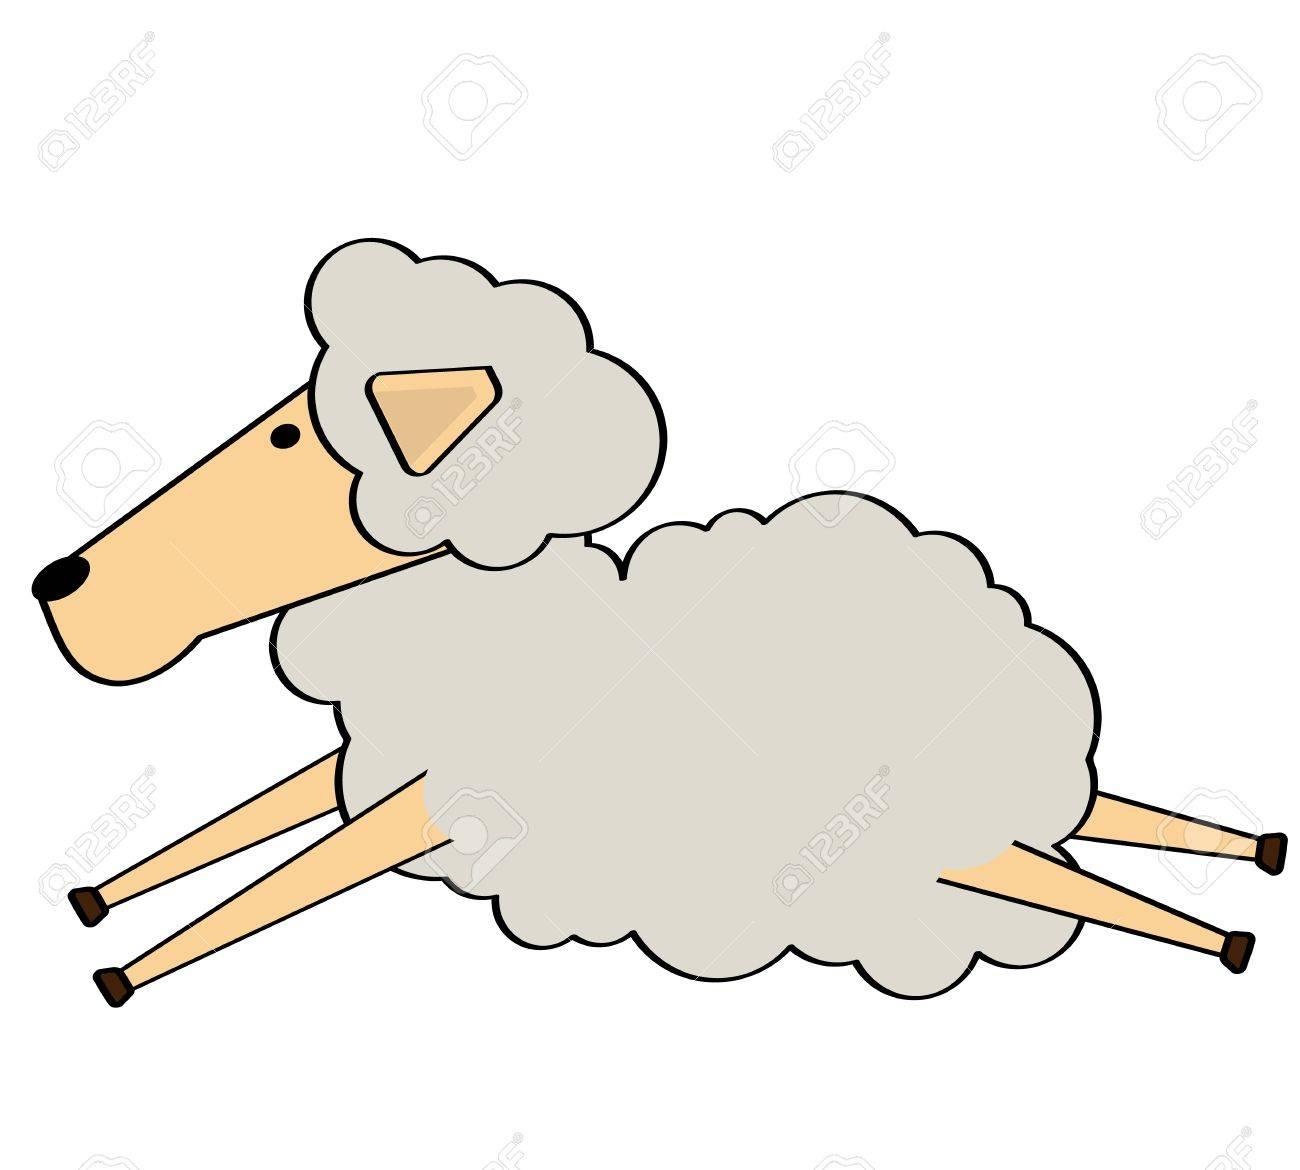 Sheep jump cartoon.Character design Stock Vector - 18542449